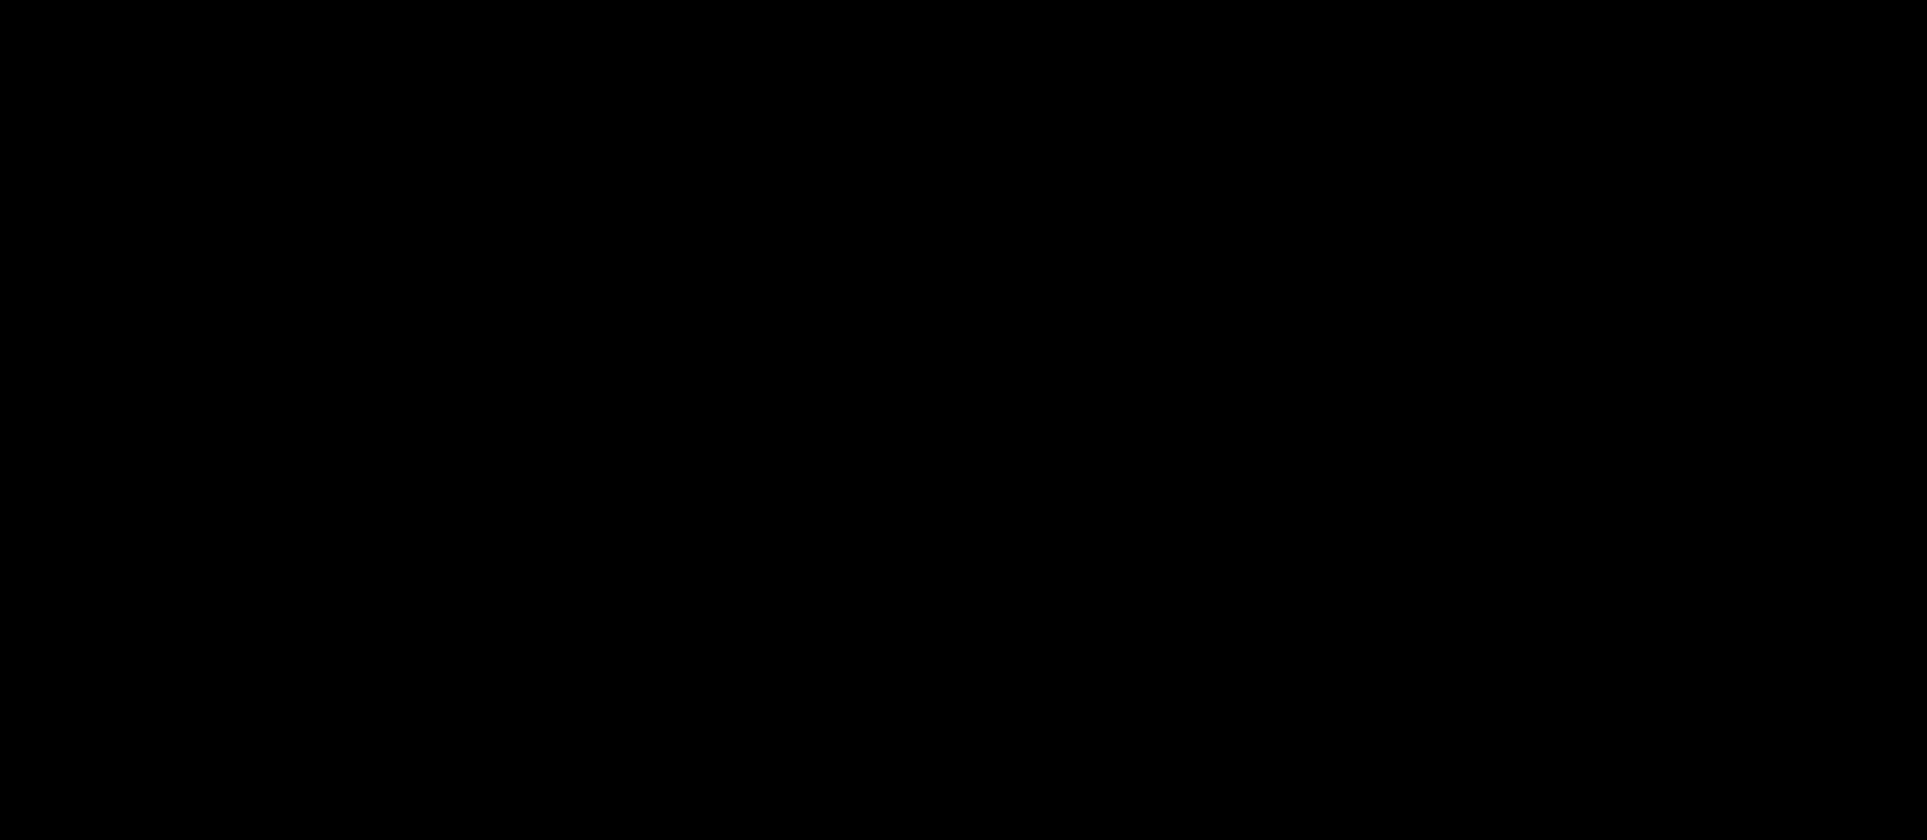 Clipart Aeroplane Silhouette